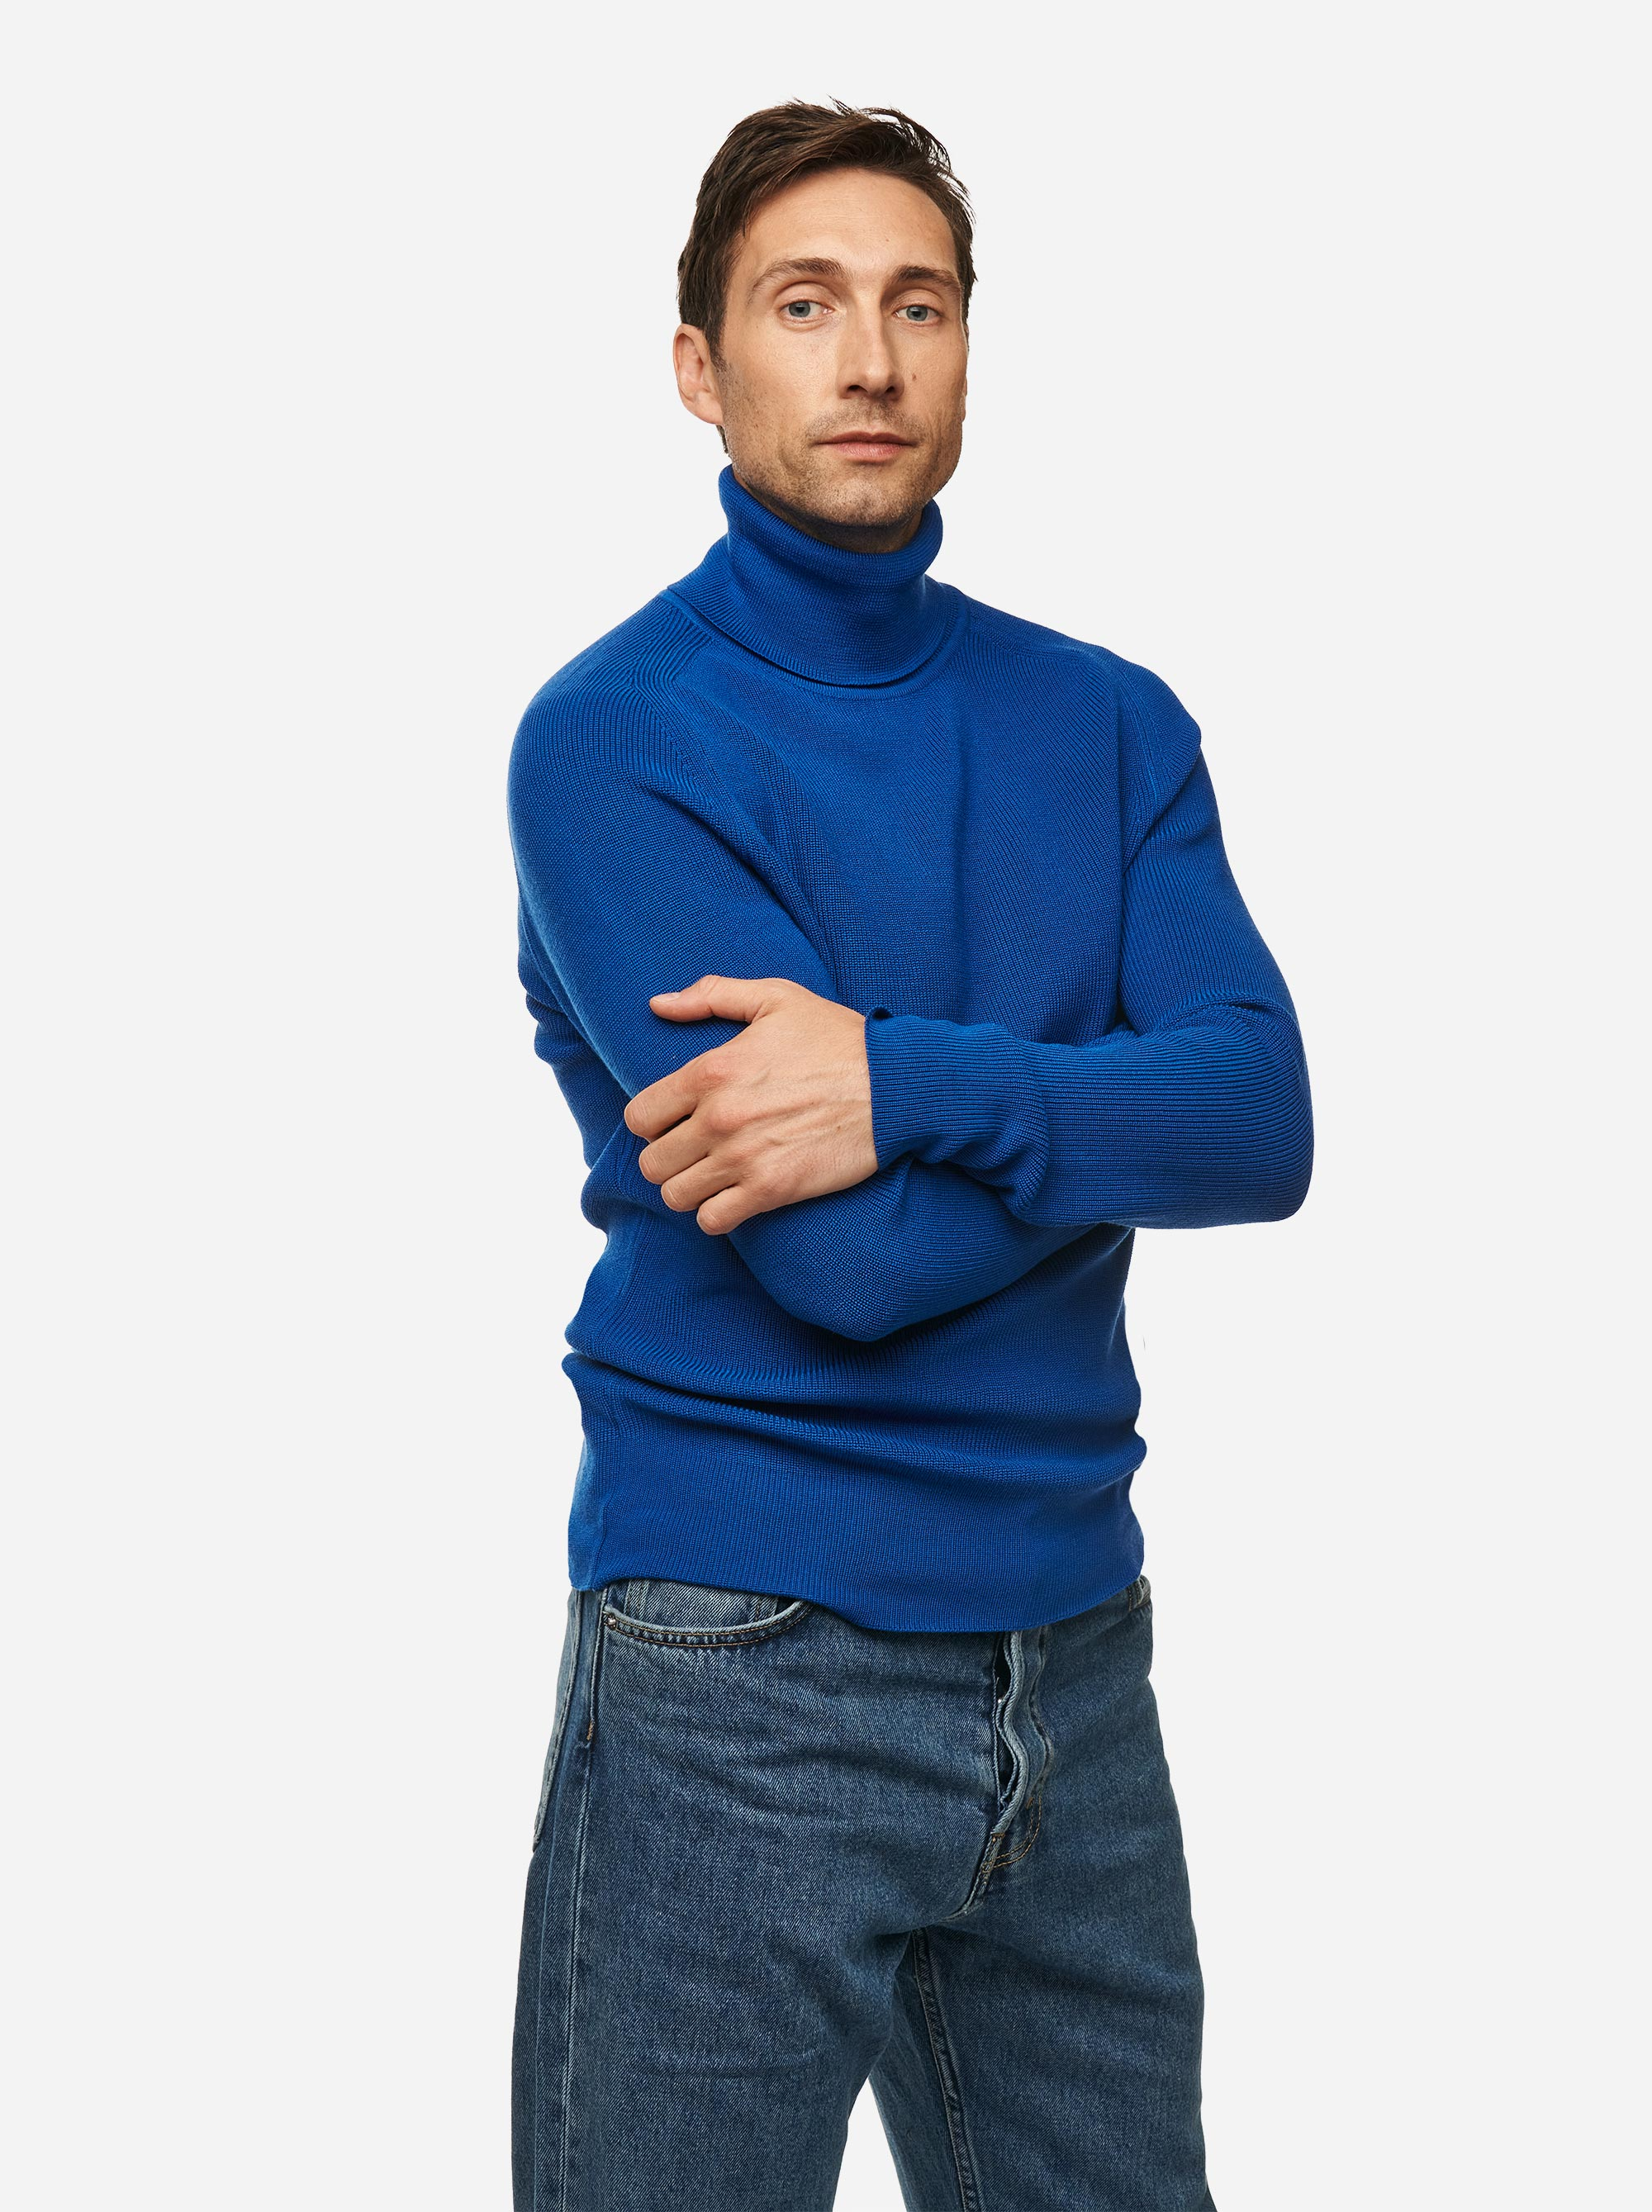 Teym - Turtleneck - The Merino Sweater - Men - Cobalt blue - 2